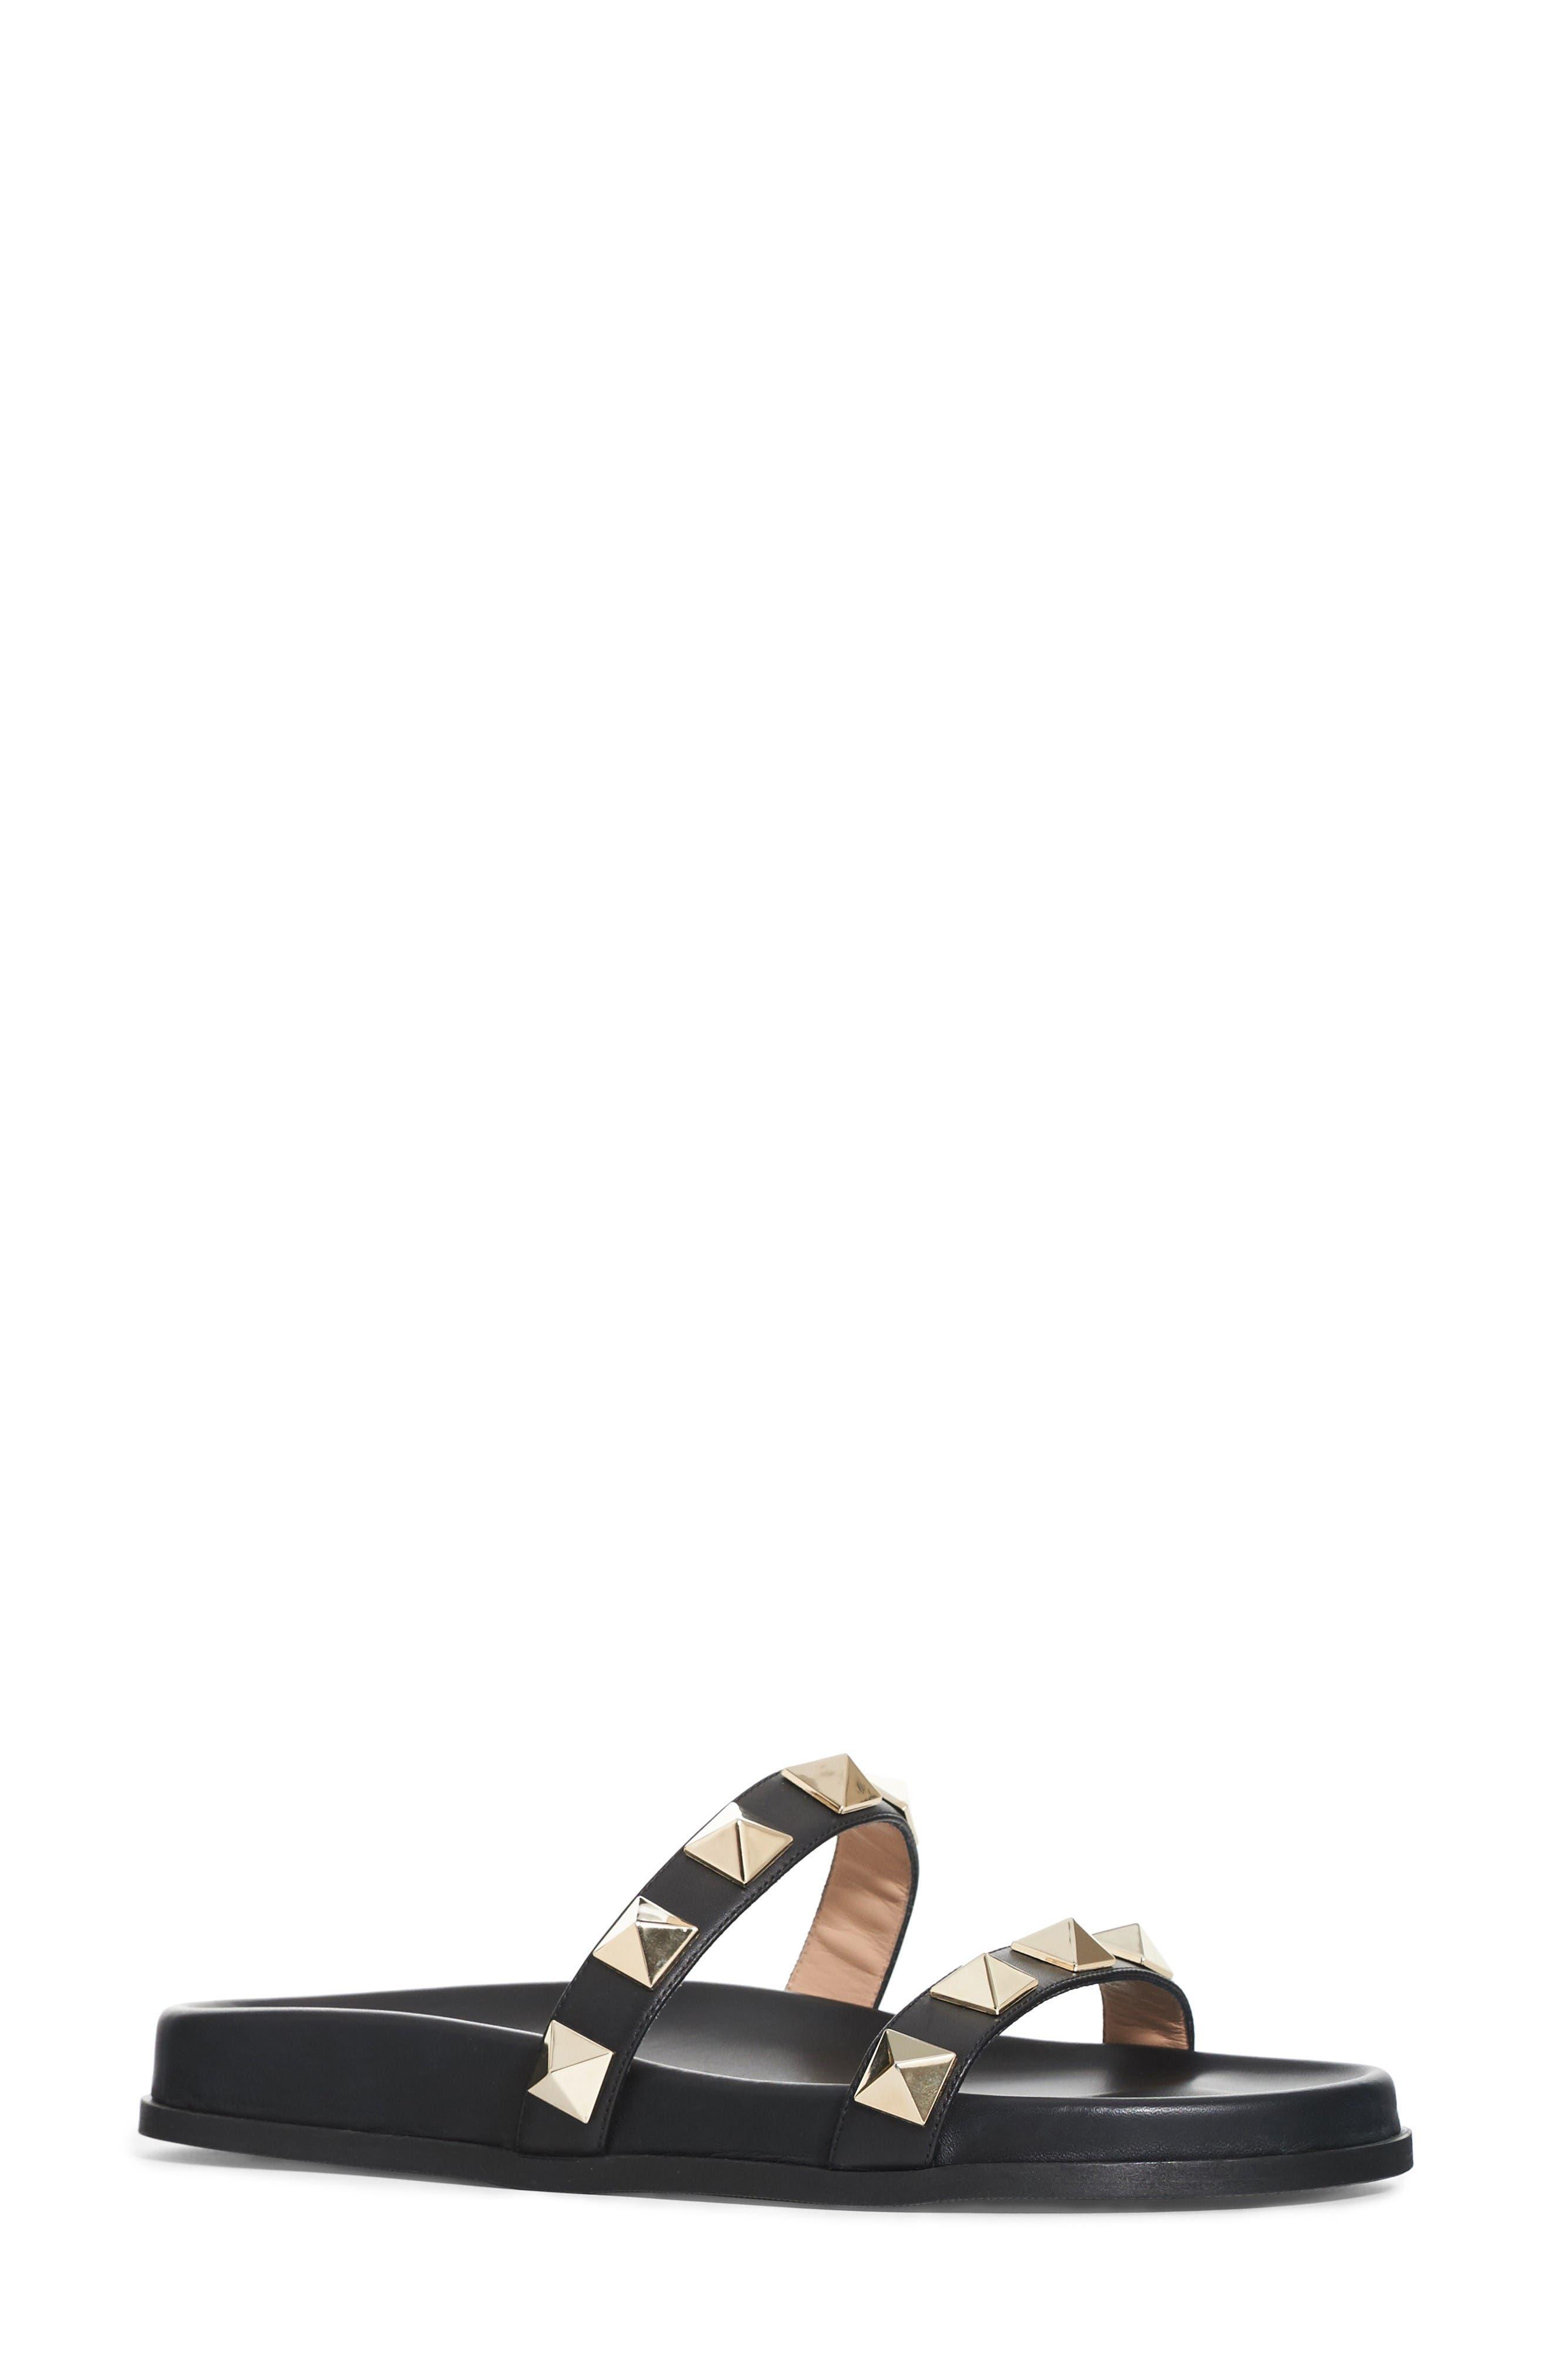 Main Image - VALENTINO GARAVANI Rockstud Lock Slide Sandal (Women)